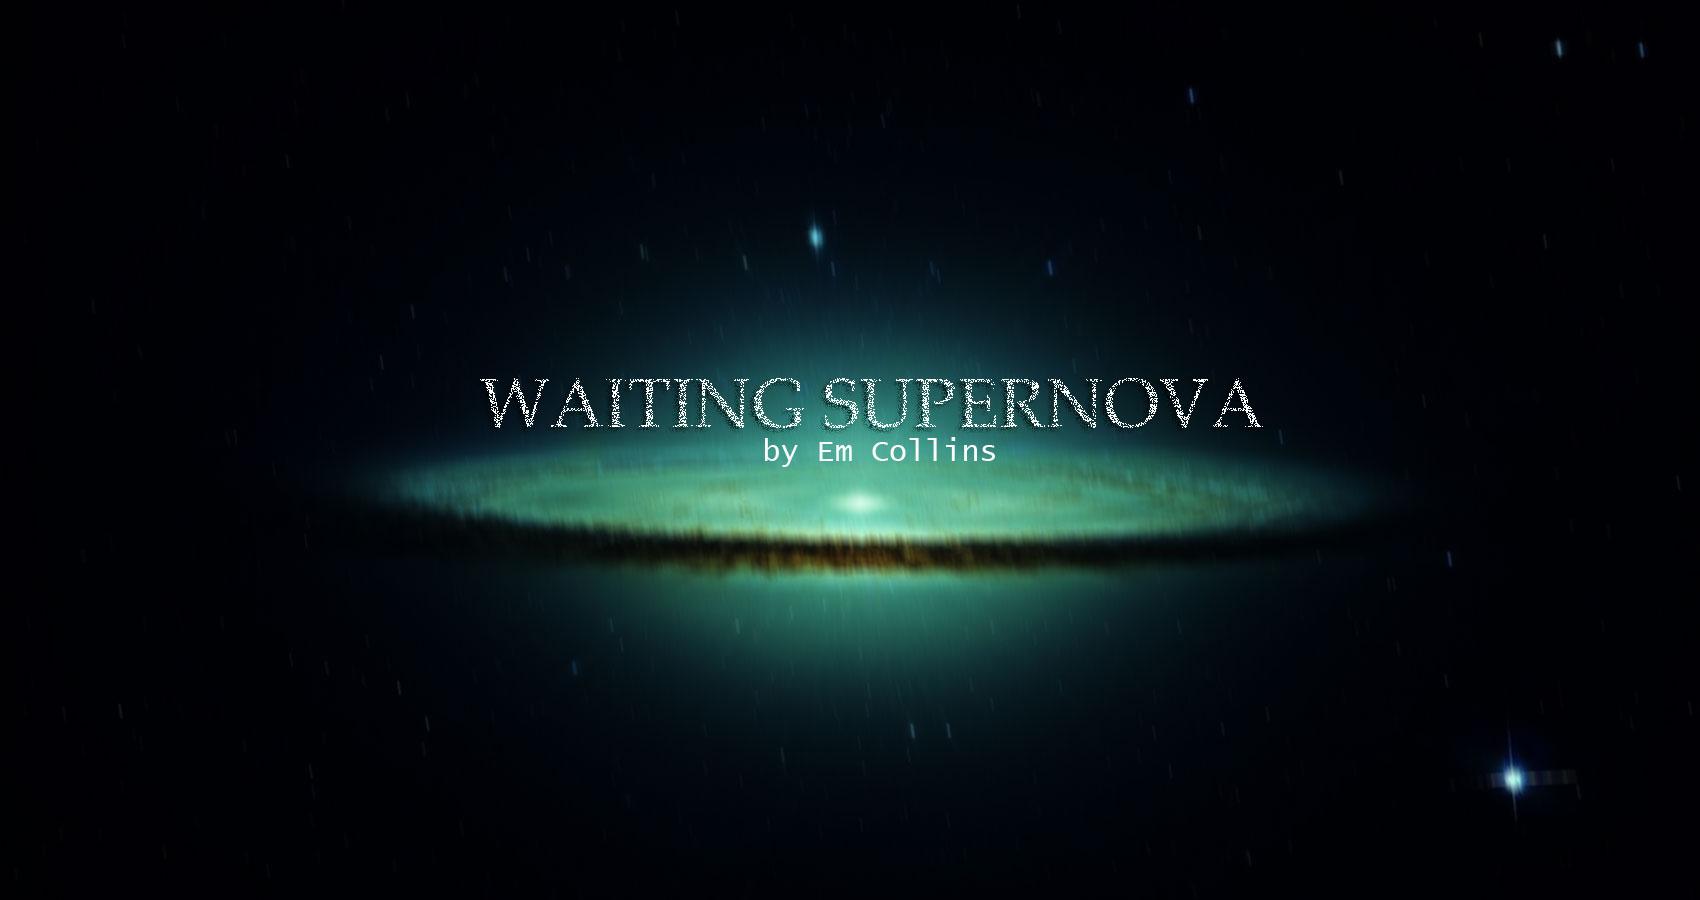 Waiting Supernova at Spillwords.com